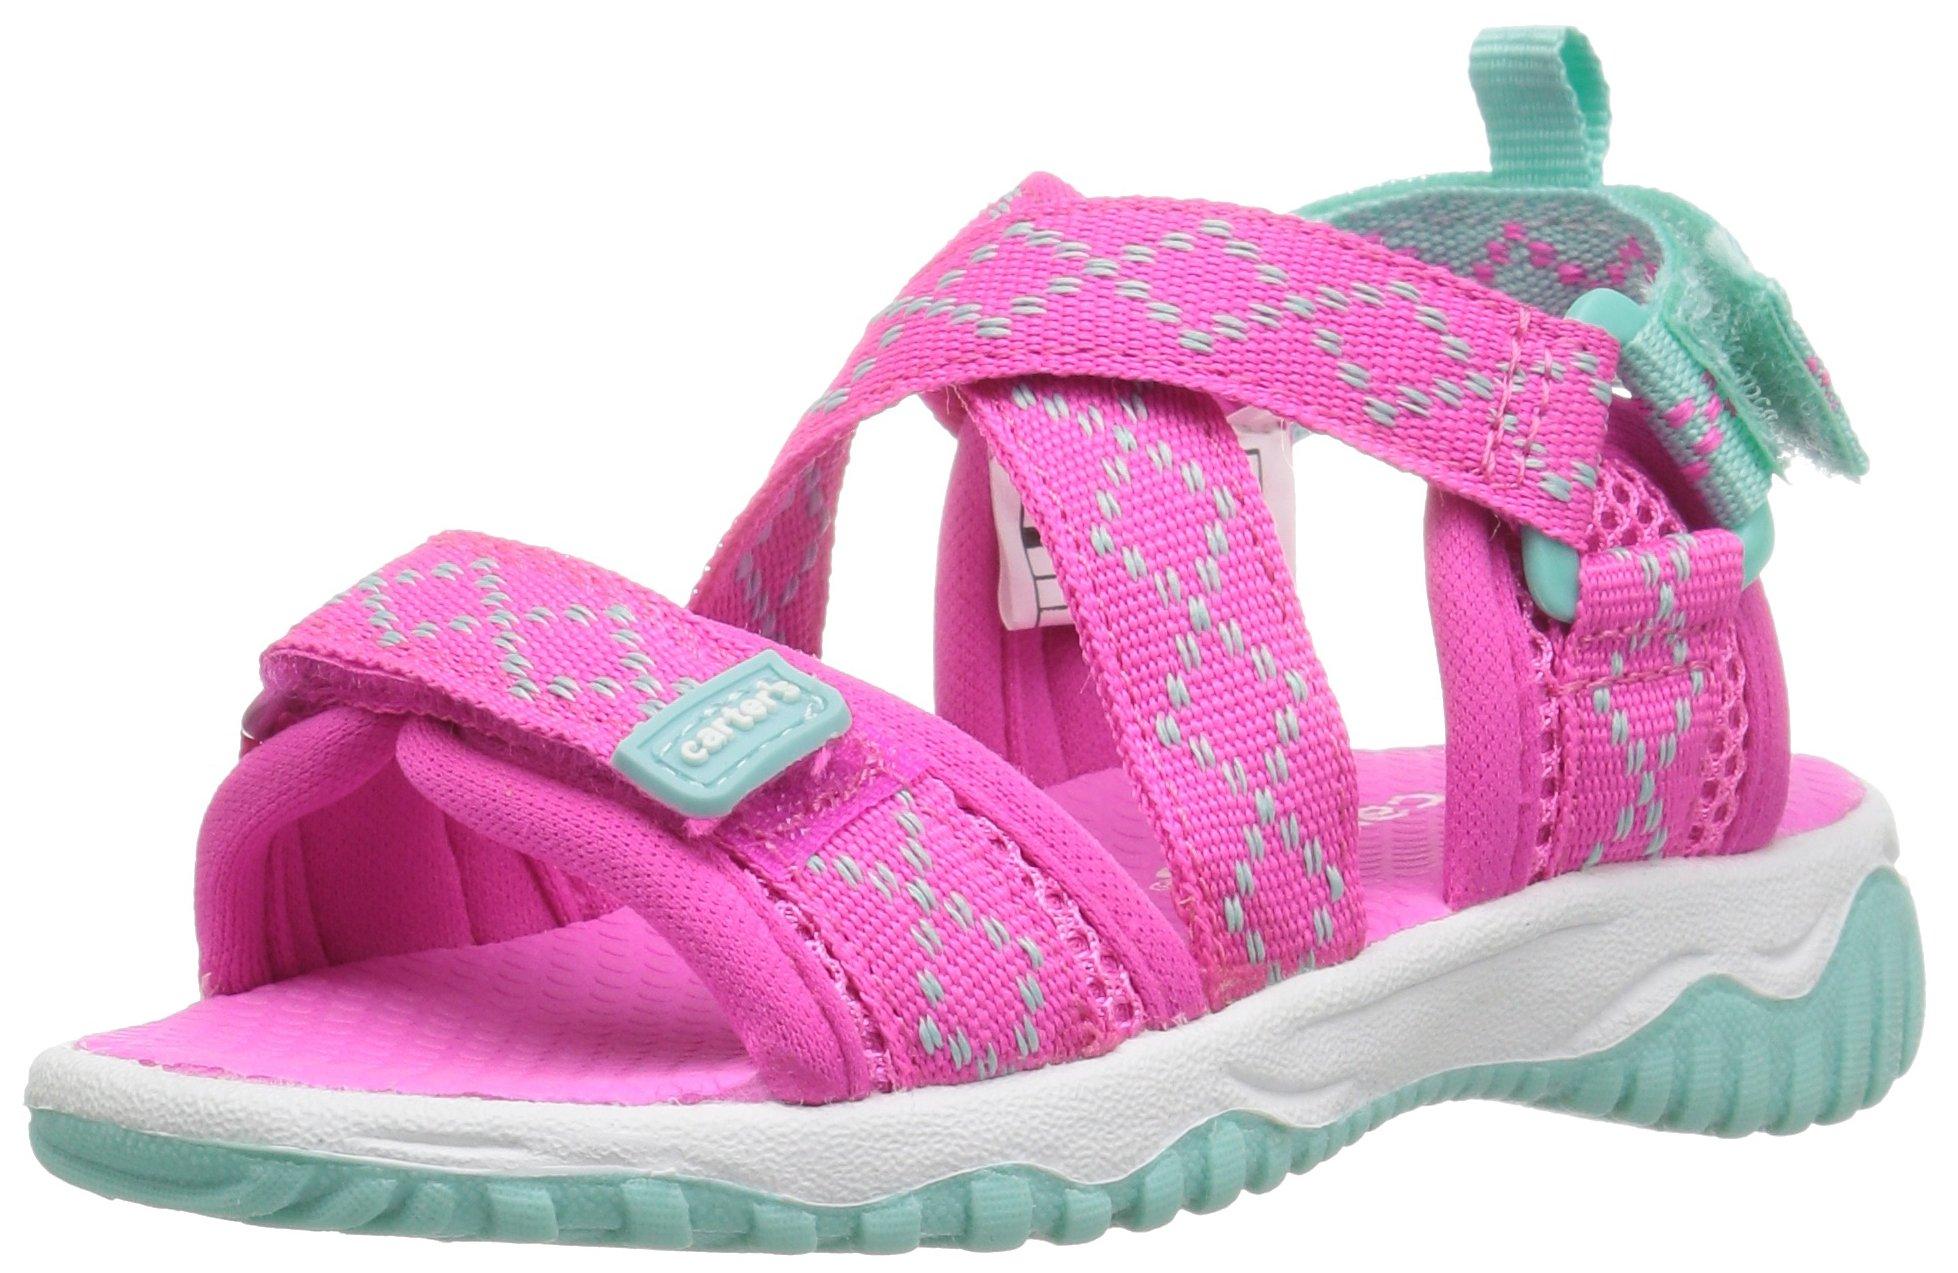 carter's Splash Girl's and Boy's Athletic Sandal, Pink/Turquoise, 12 M US Little Kid